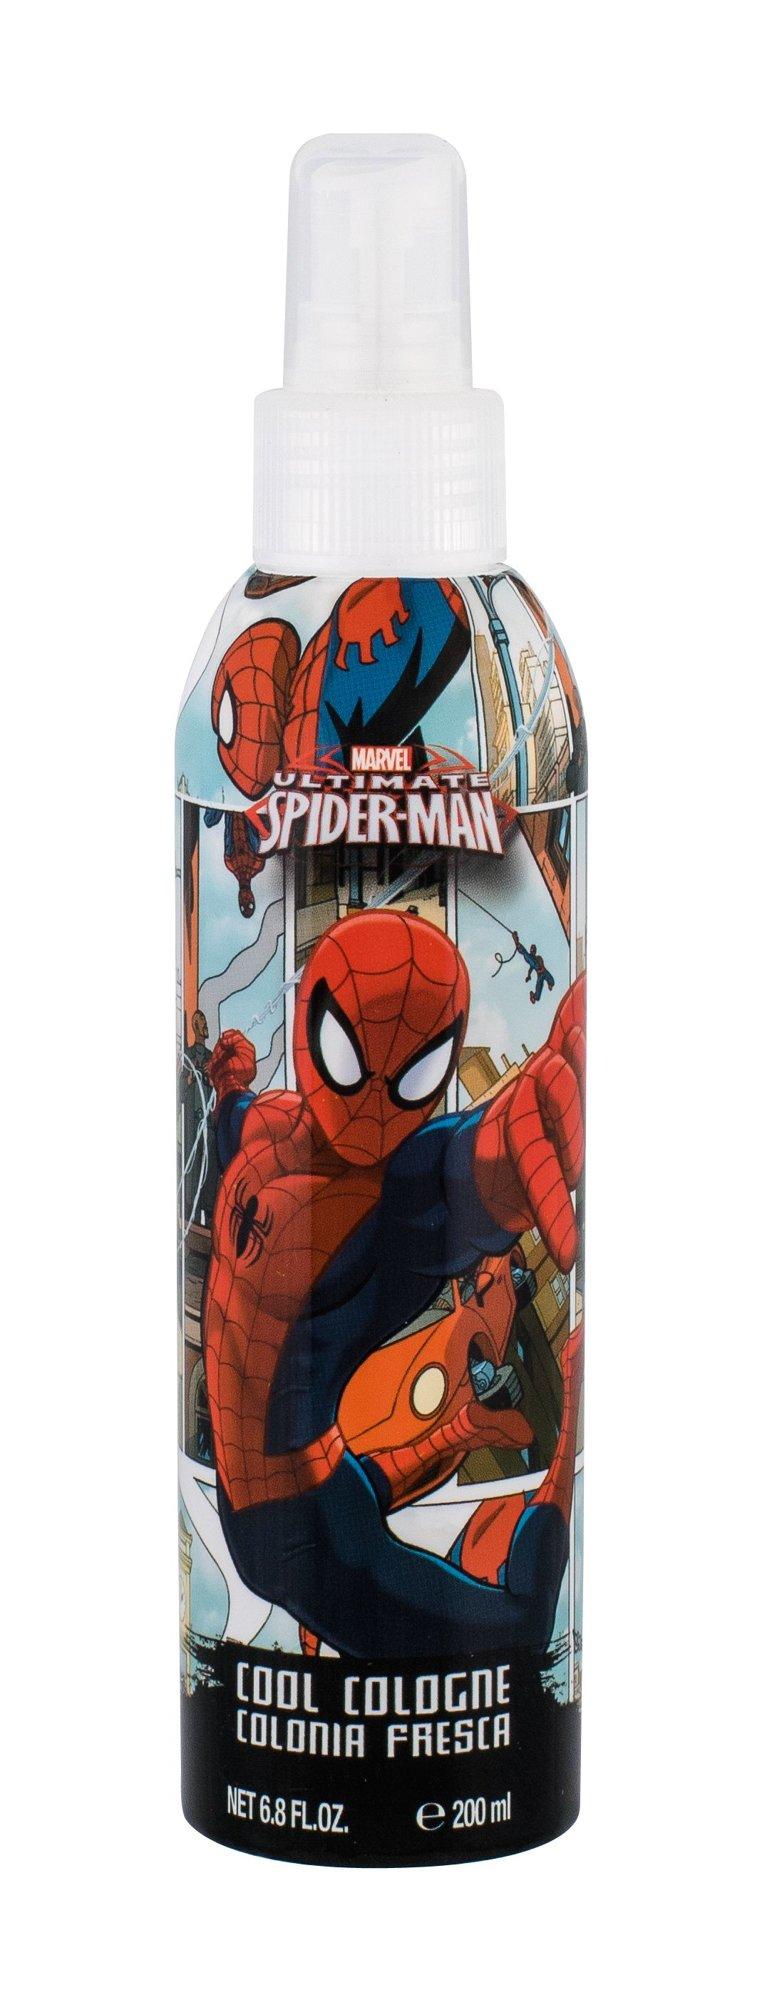 Marvel Ultimate Spiderman Body Spray 200ml